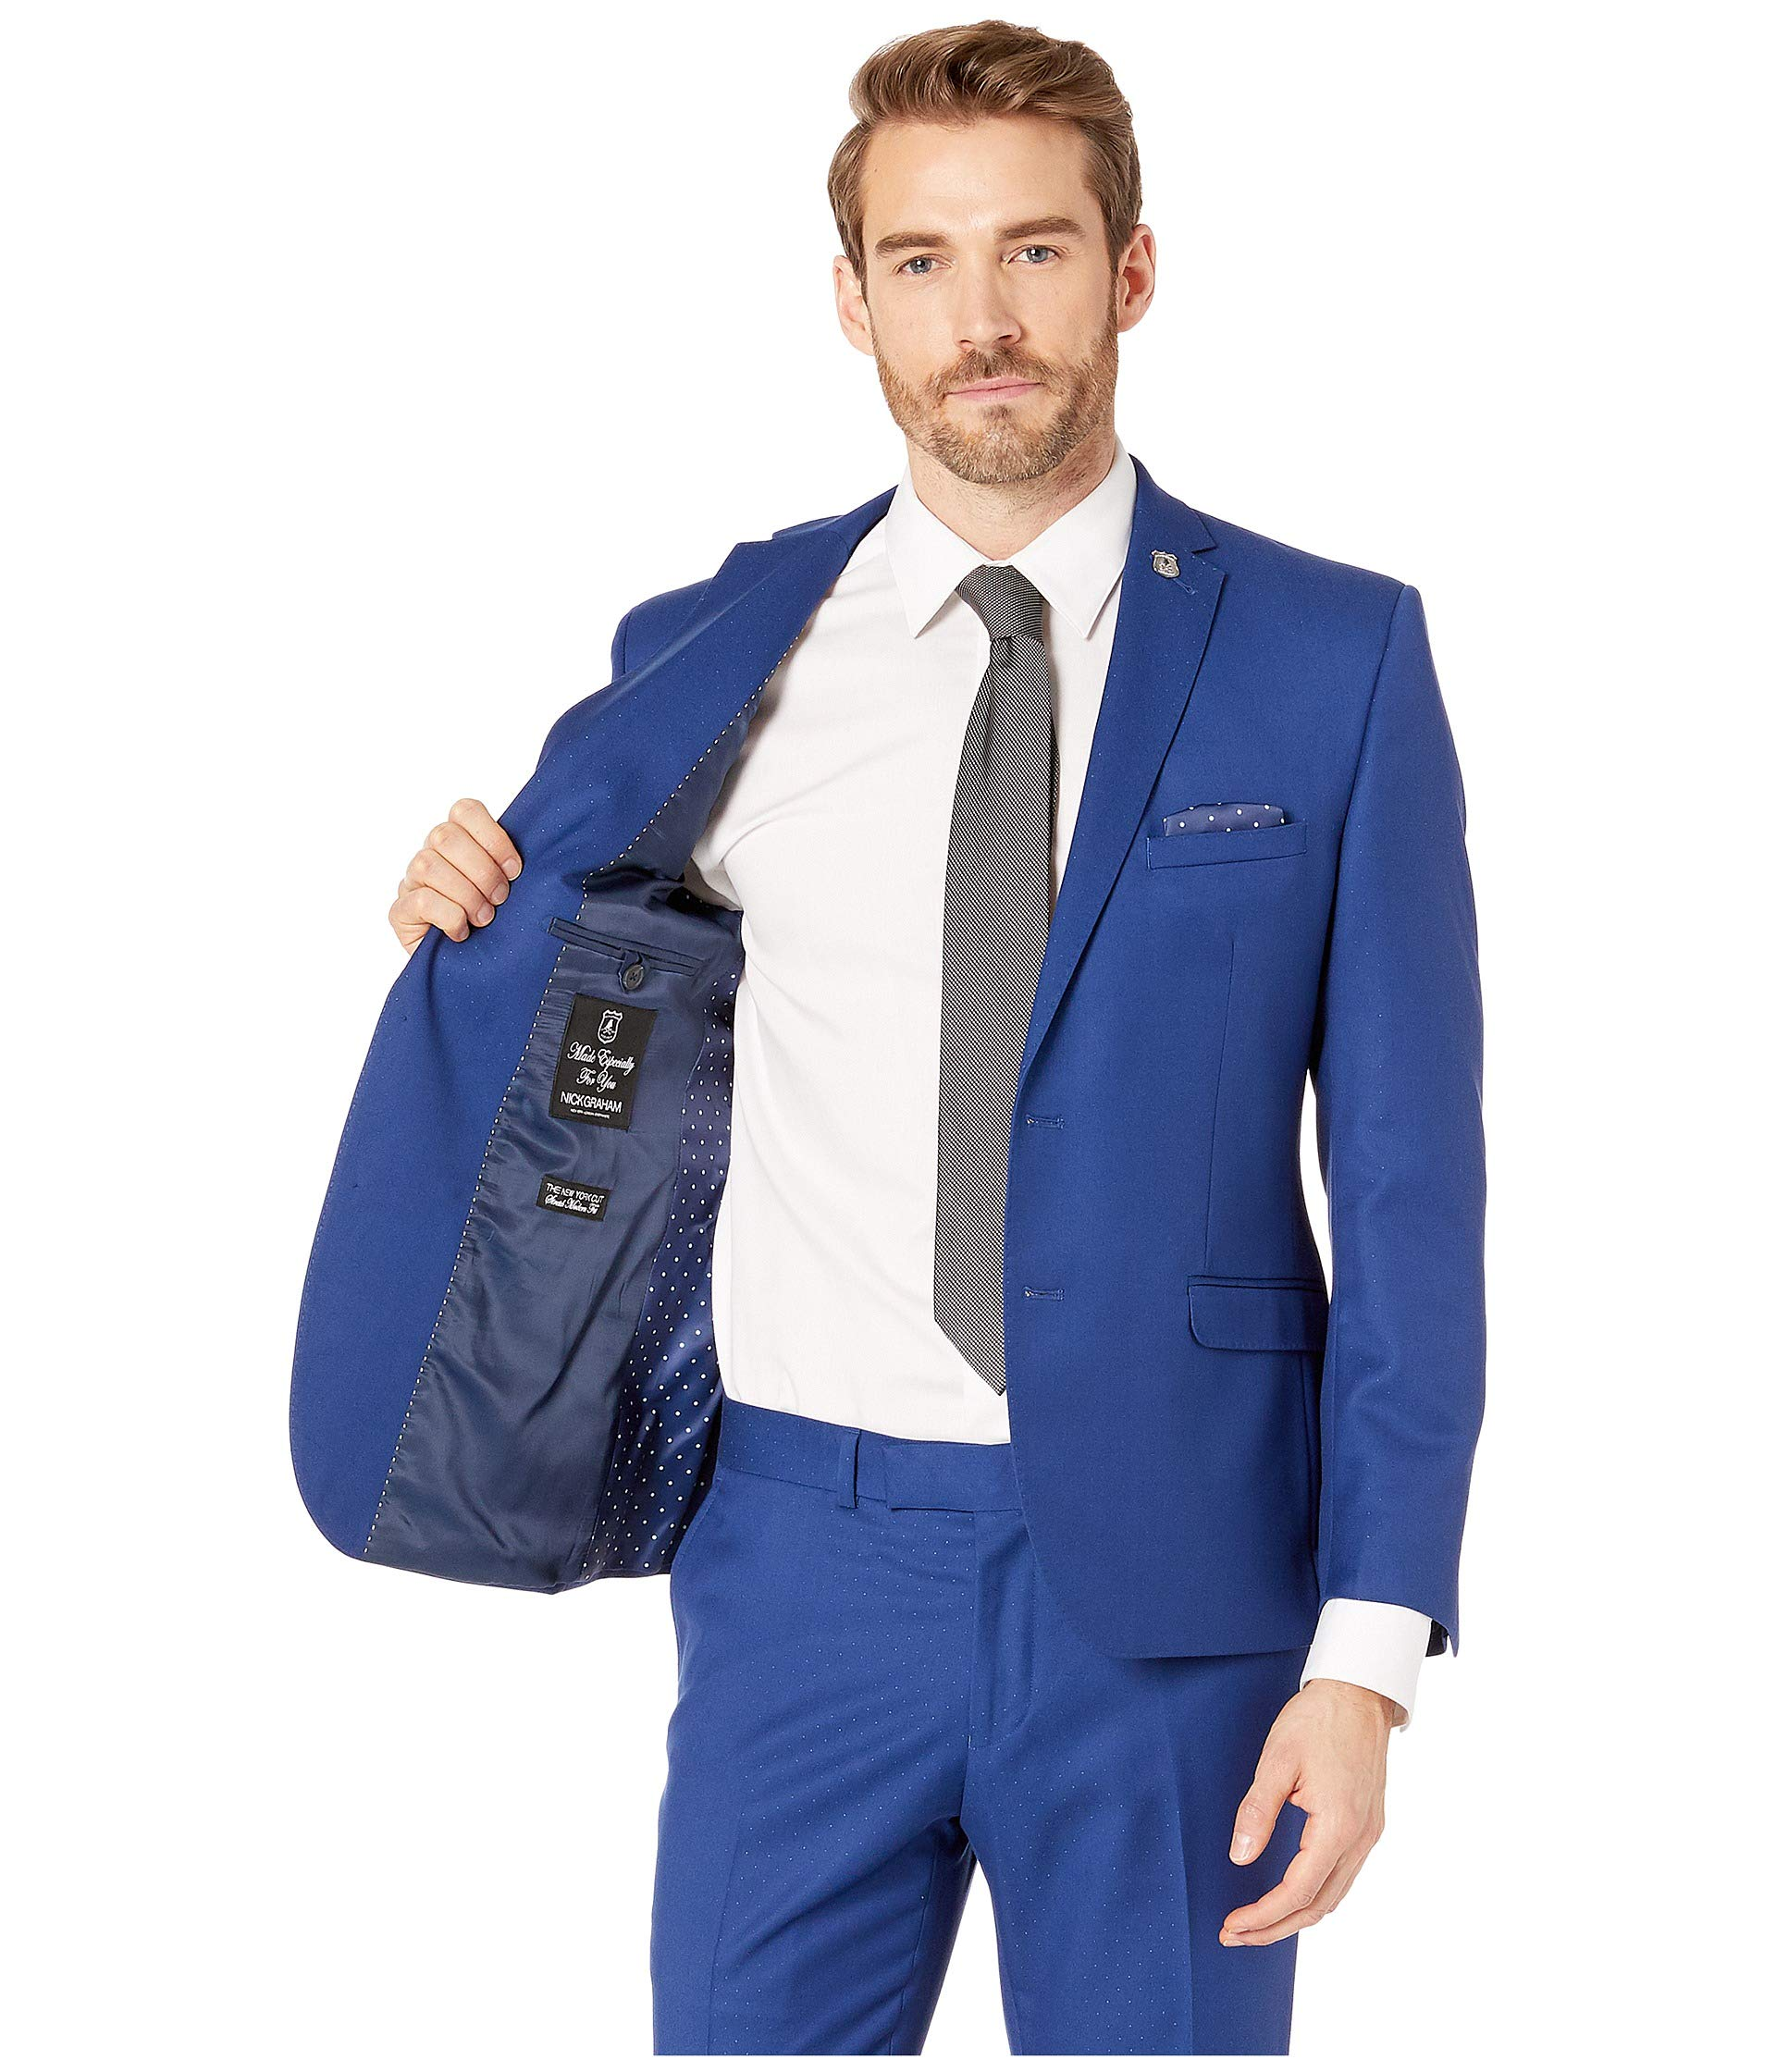 Graham Blue Pindot Nick Bright Suit 8qBqdw